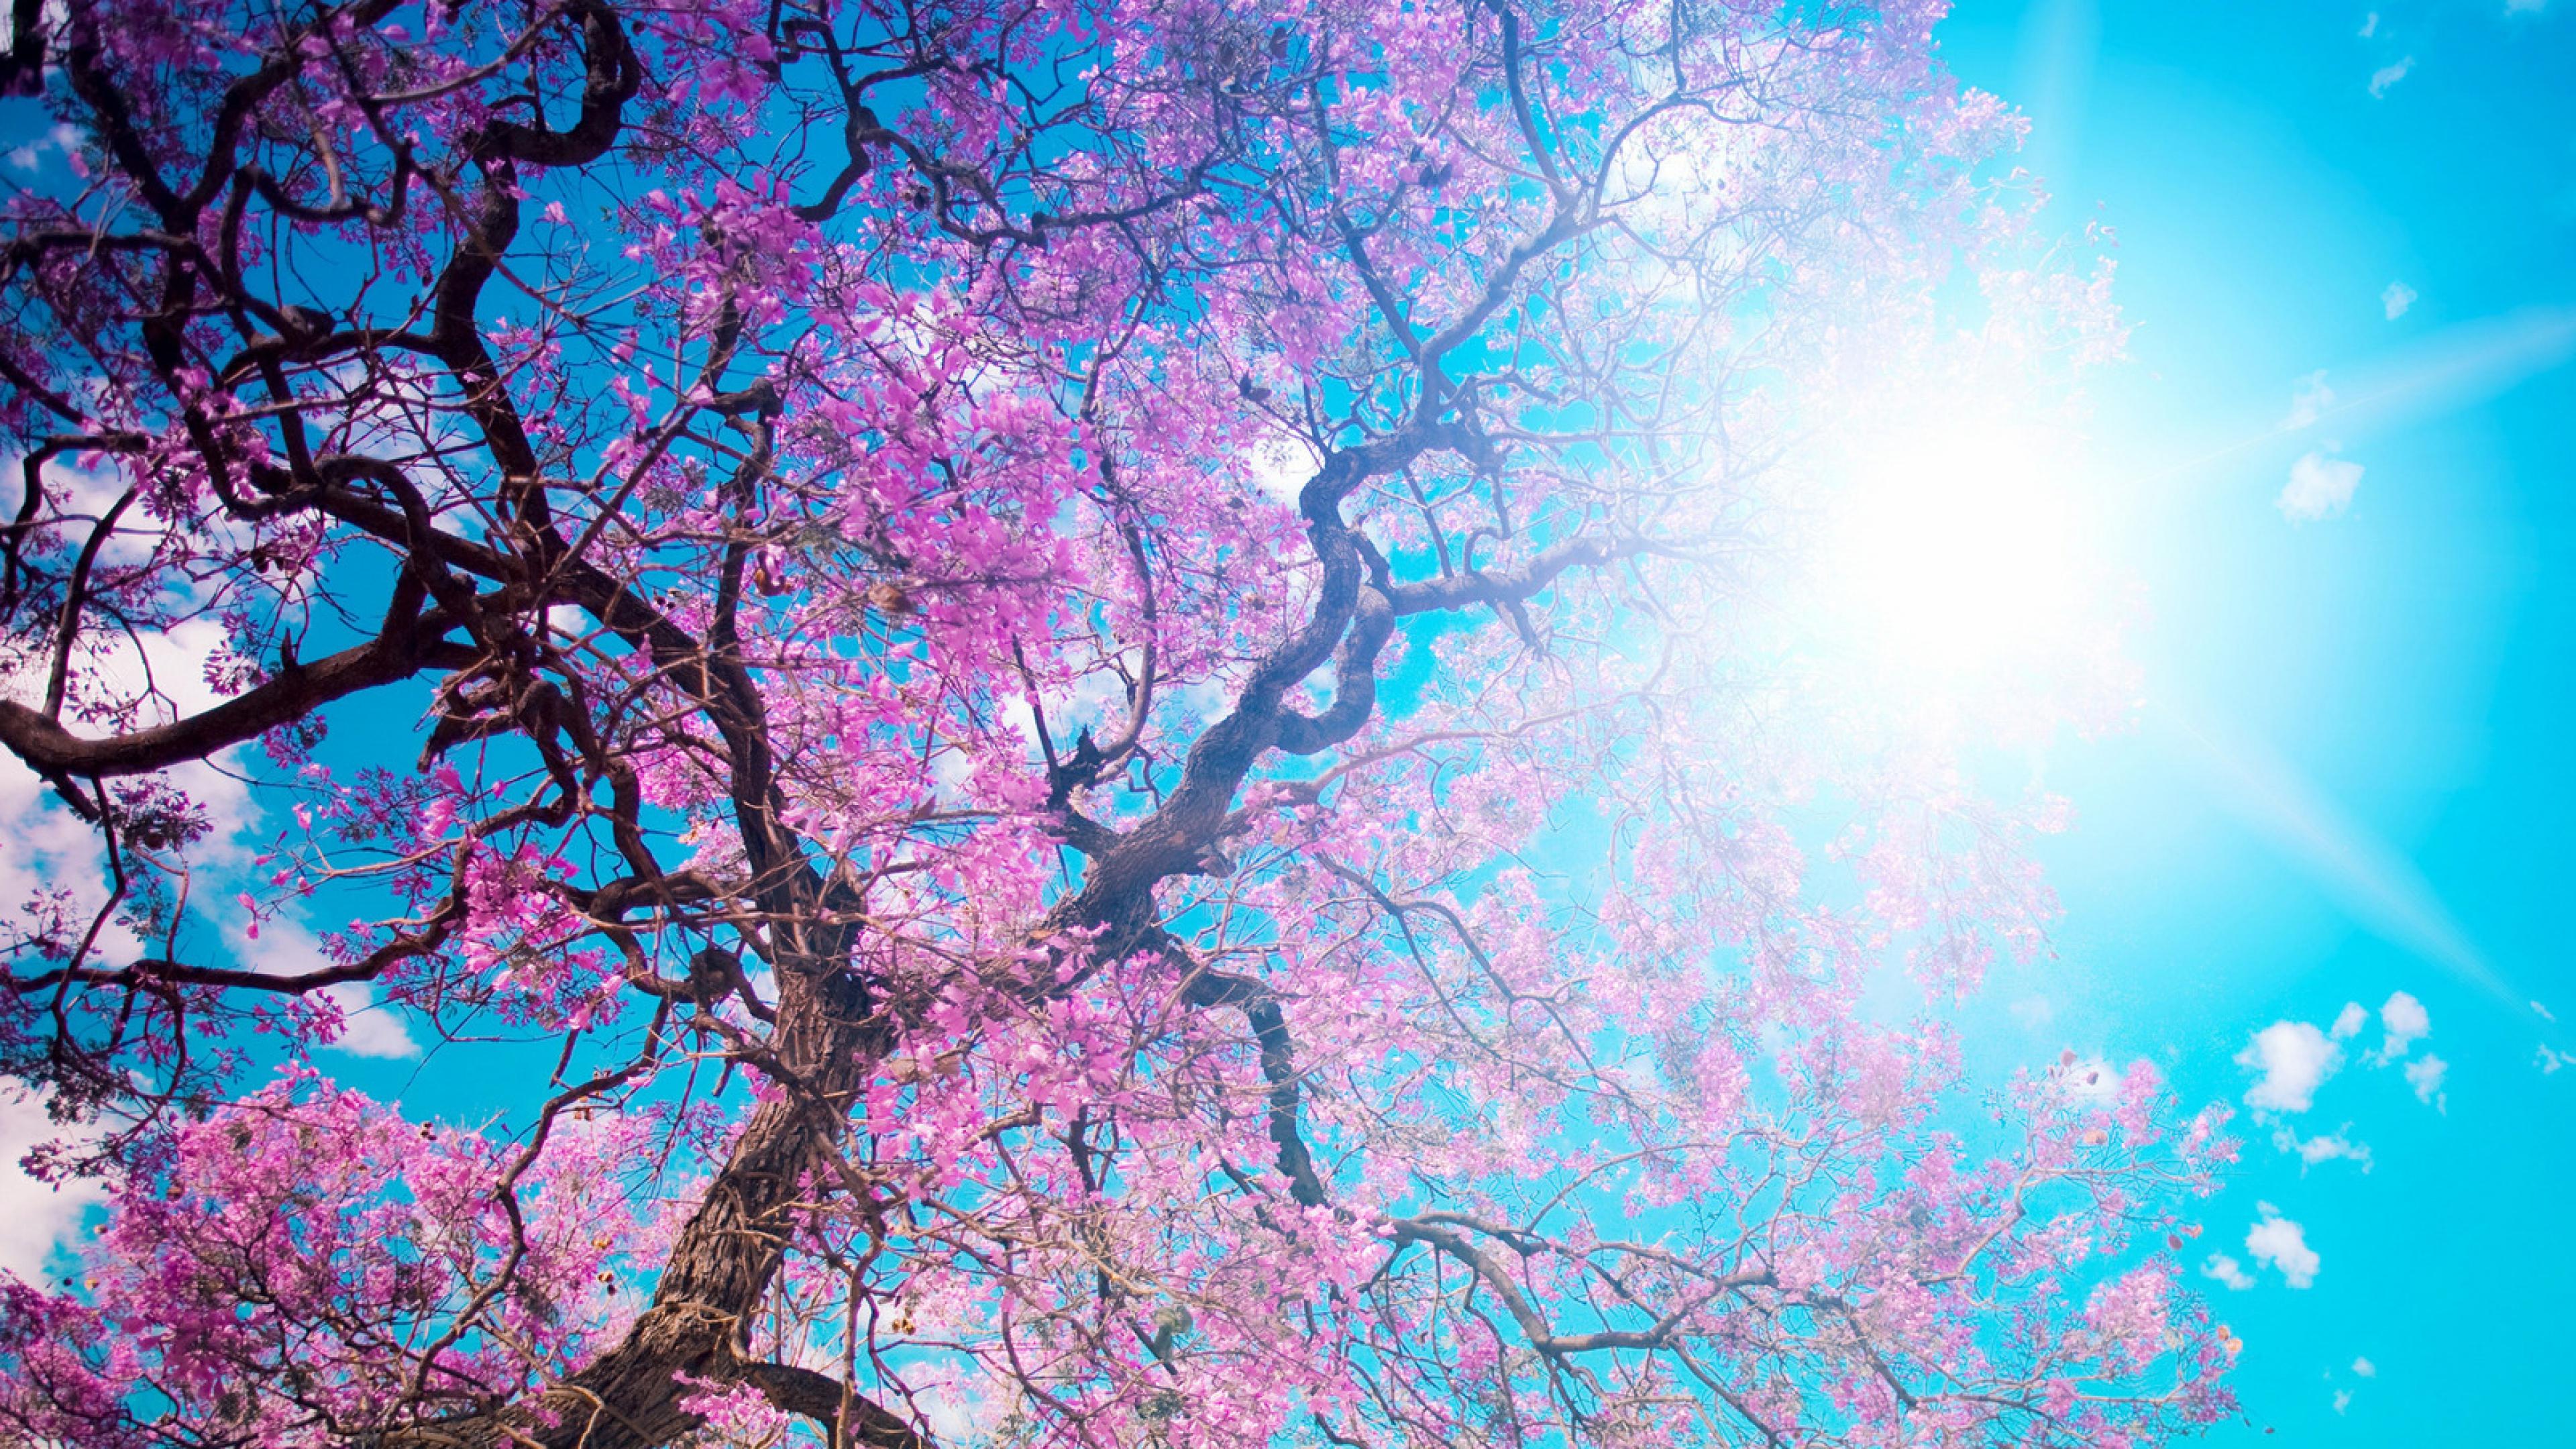 3840x2160 Wallpaper o hanami blossom festival and to enjoy the cherry 3840x2160